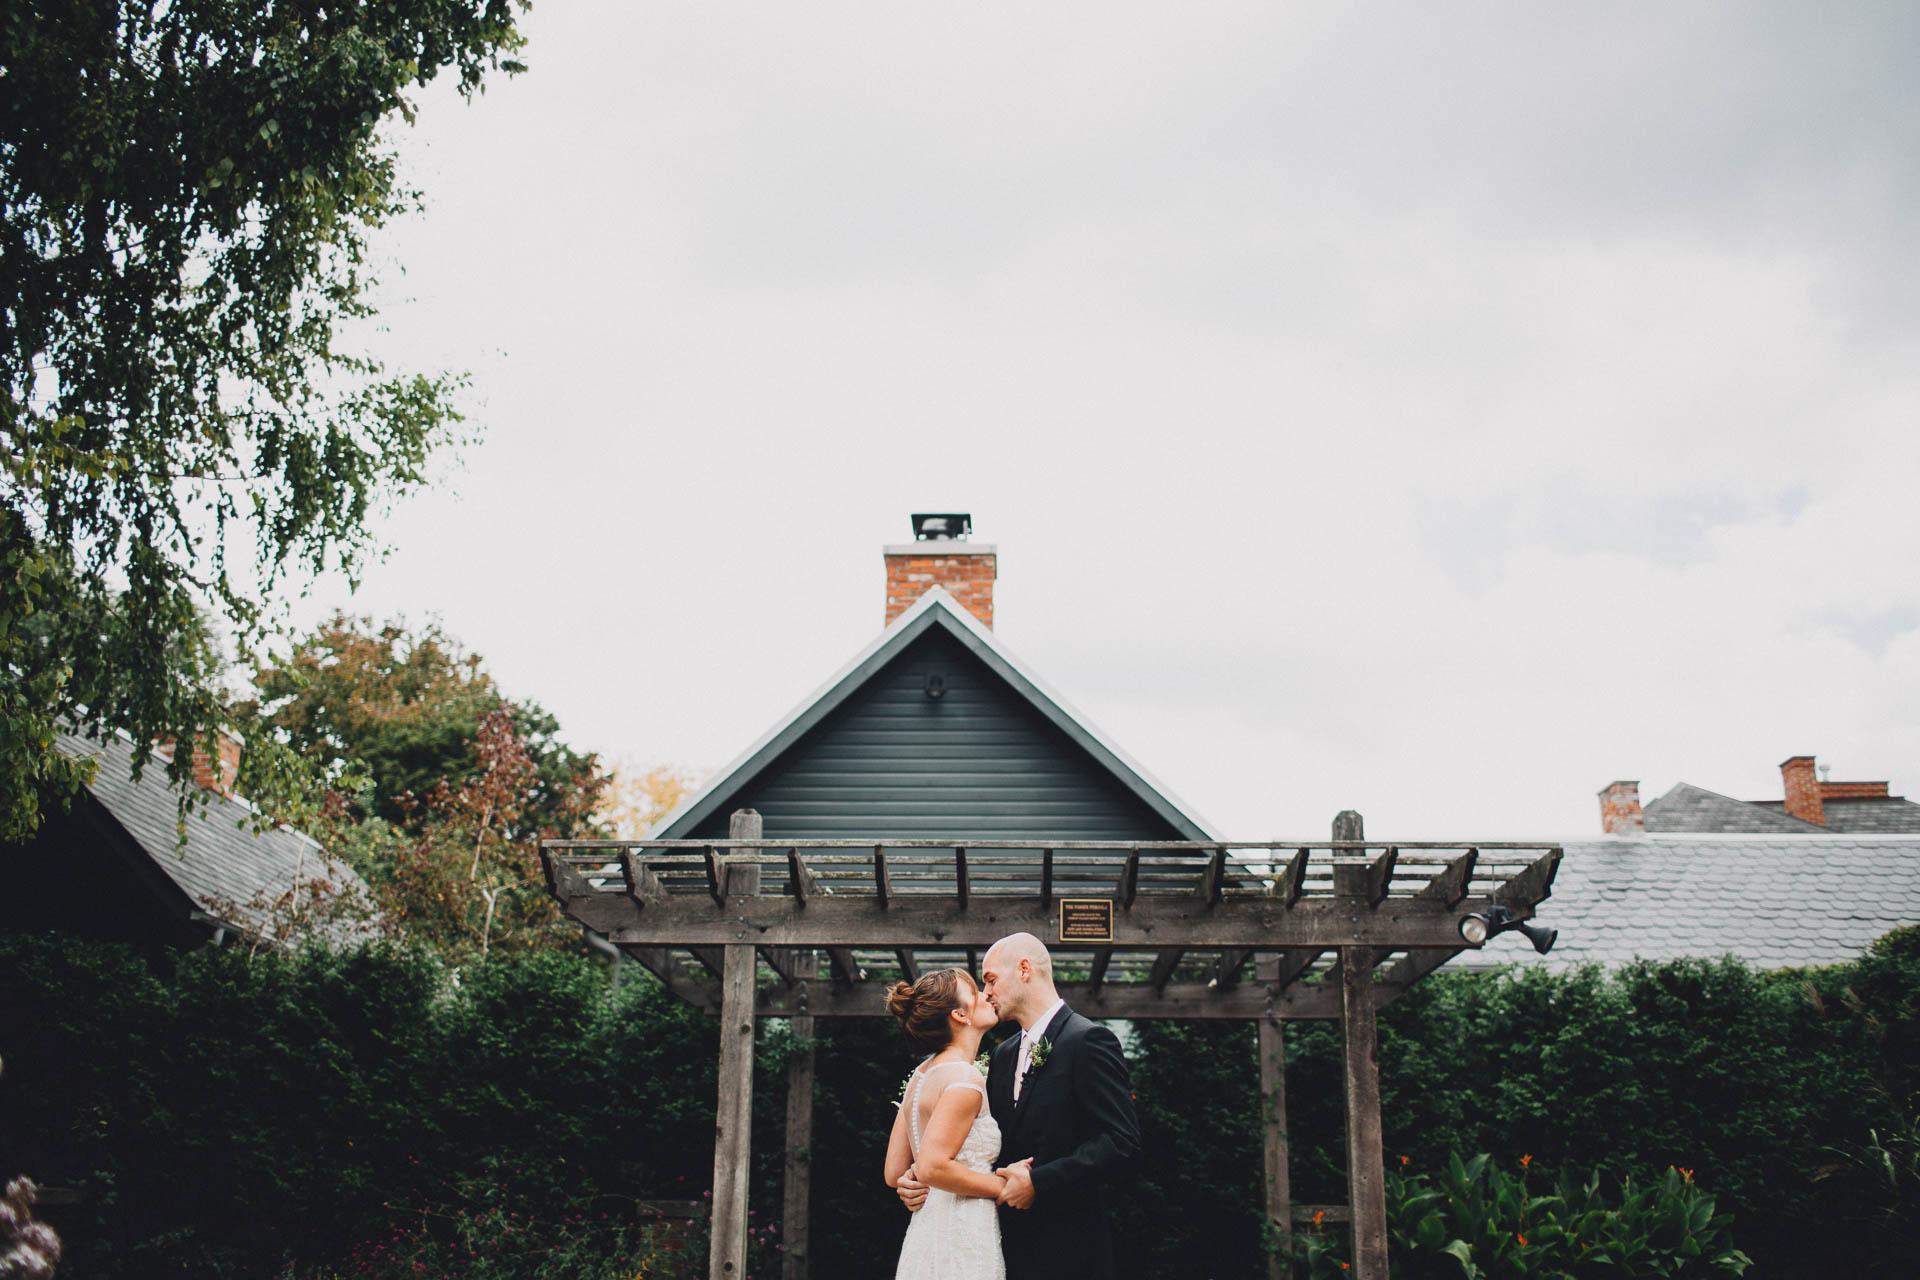 Taylor Greg Columbus Wedding Brewmasters Gate 11 First Look.jpg